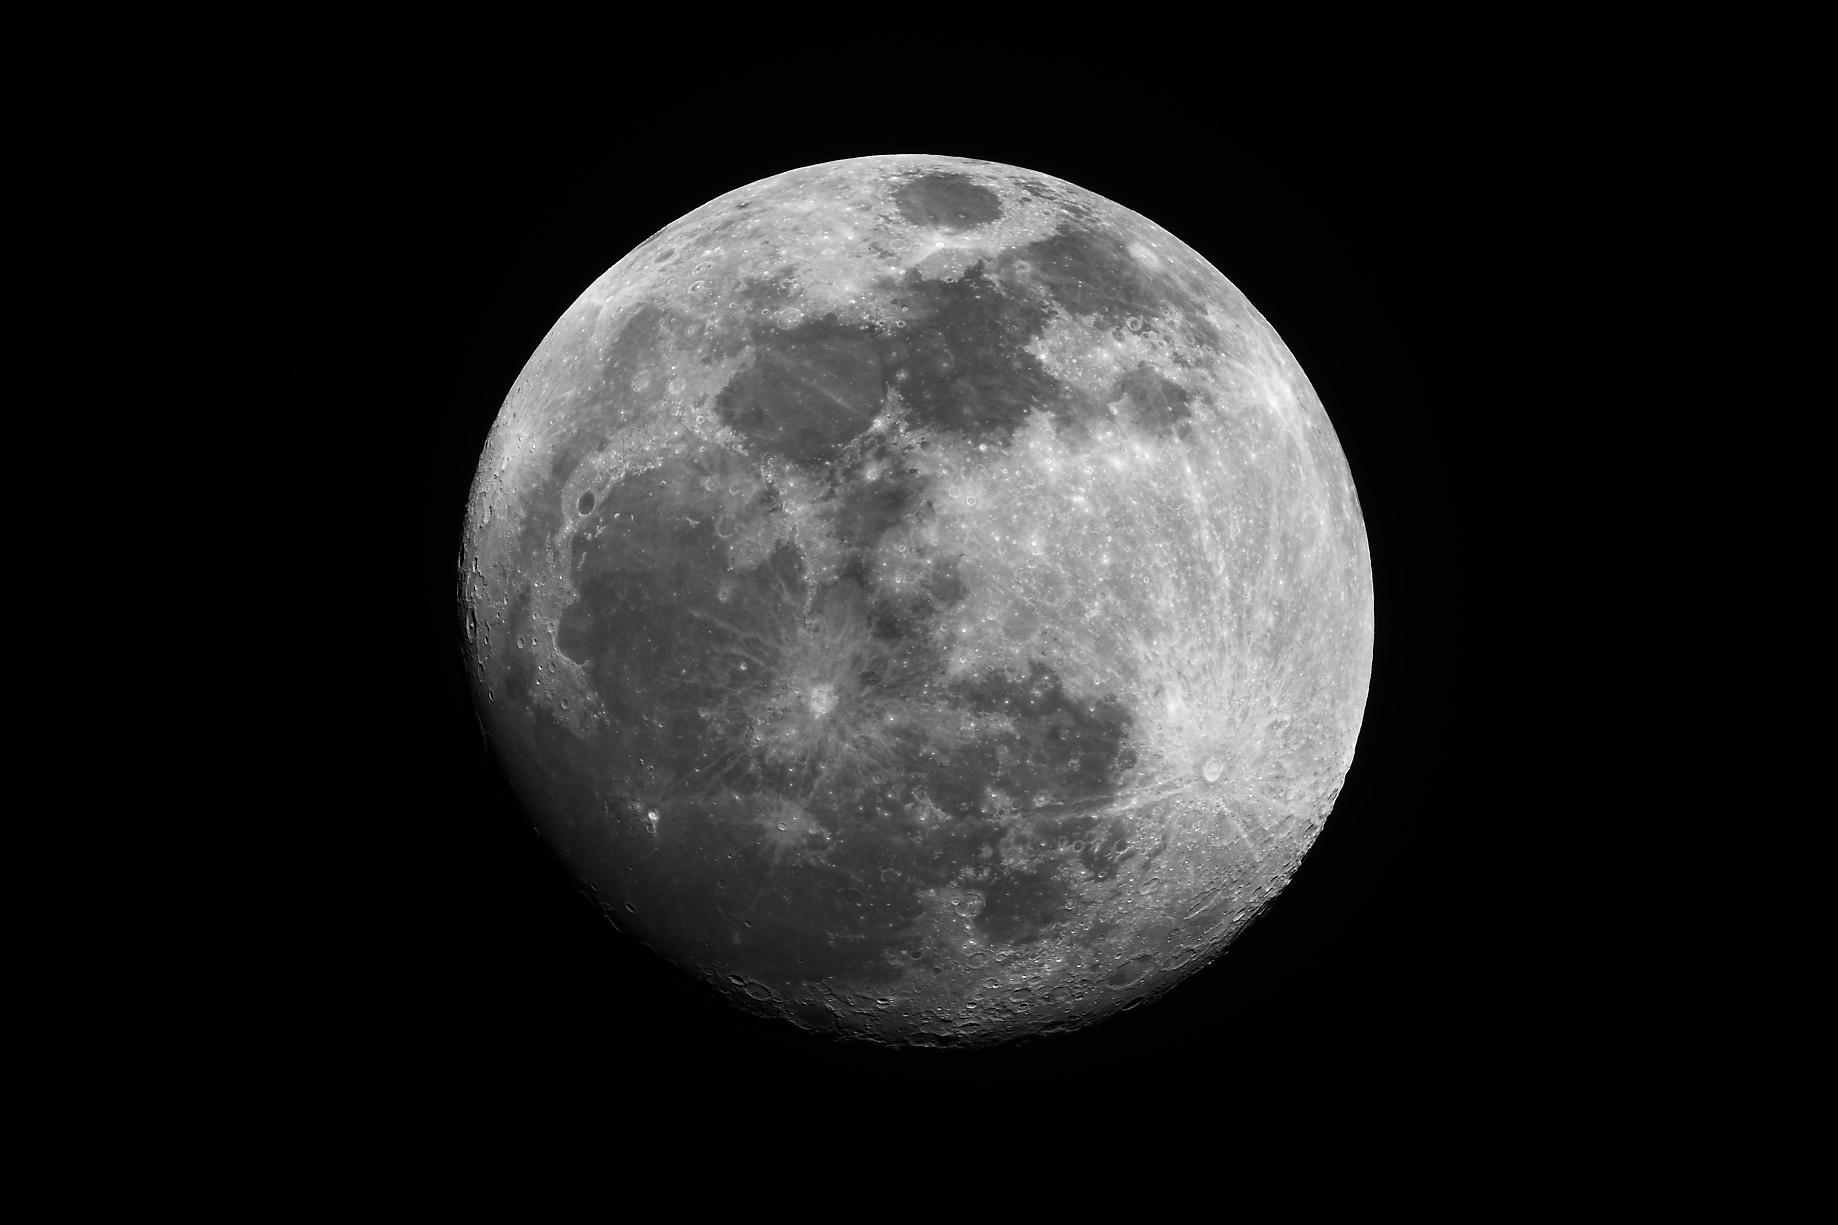 171004 - Lune gibbeuse - Pollux - STL11K